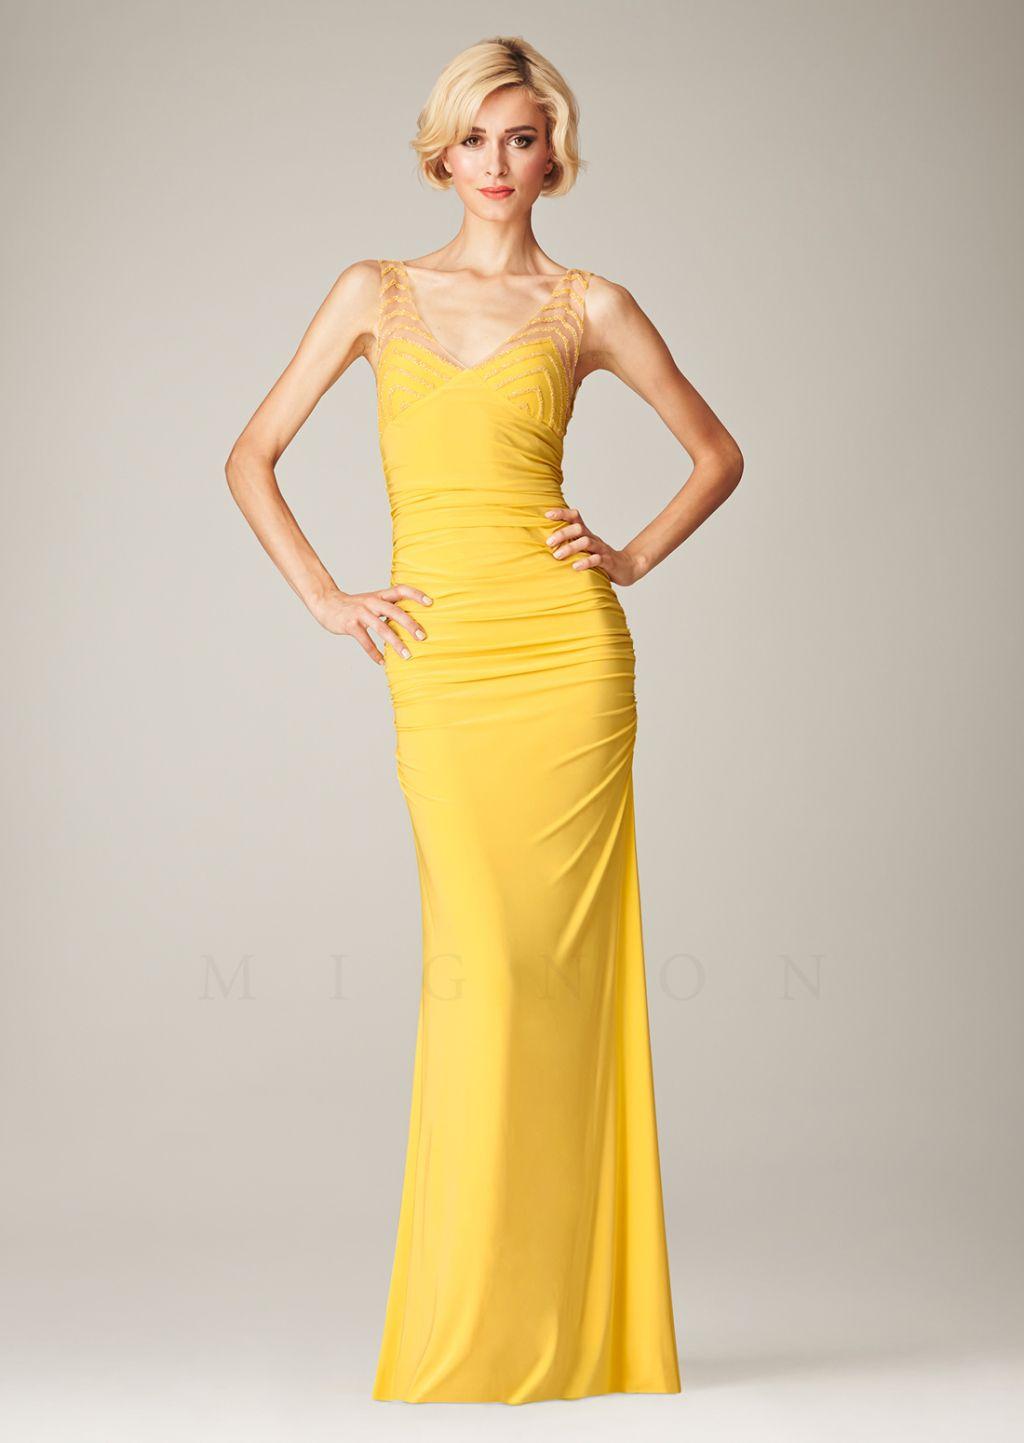 Simple yet elegant yellow cocktail dress classy dresses